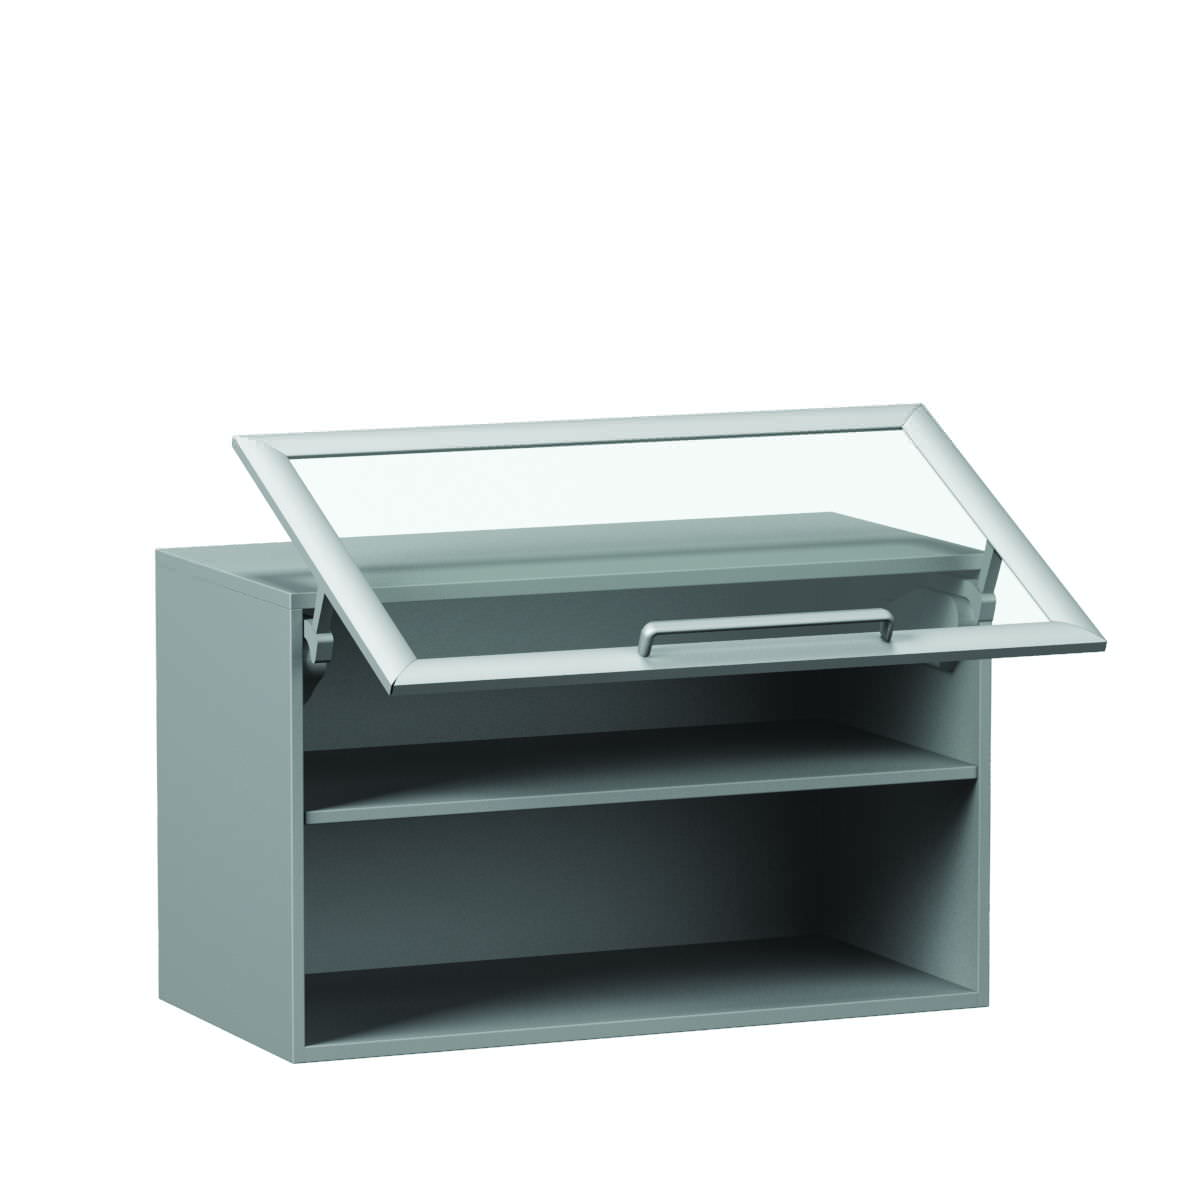 Шкаф навесной ДМ-4-002-16